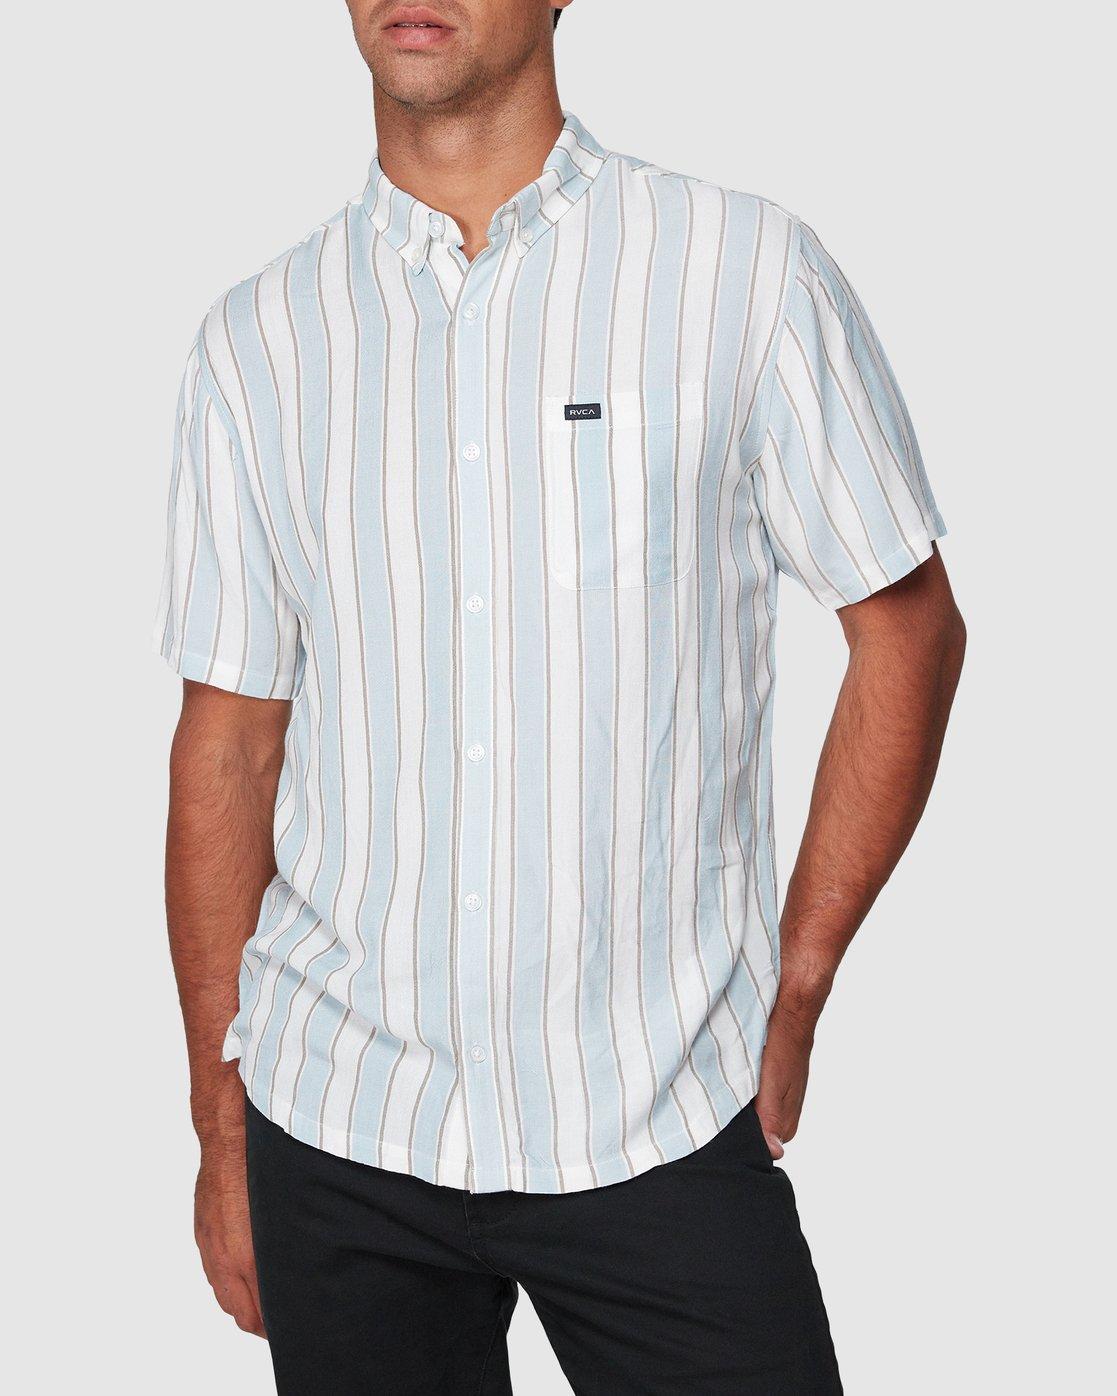 0 Caravan Stripe Short Sleeve Shirt  R192185 RVCA